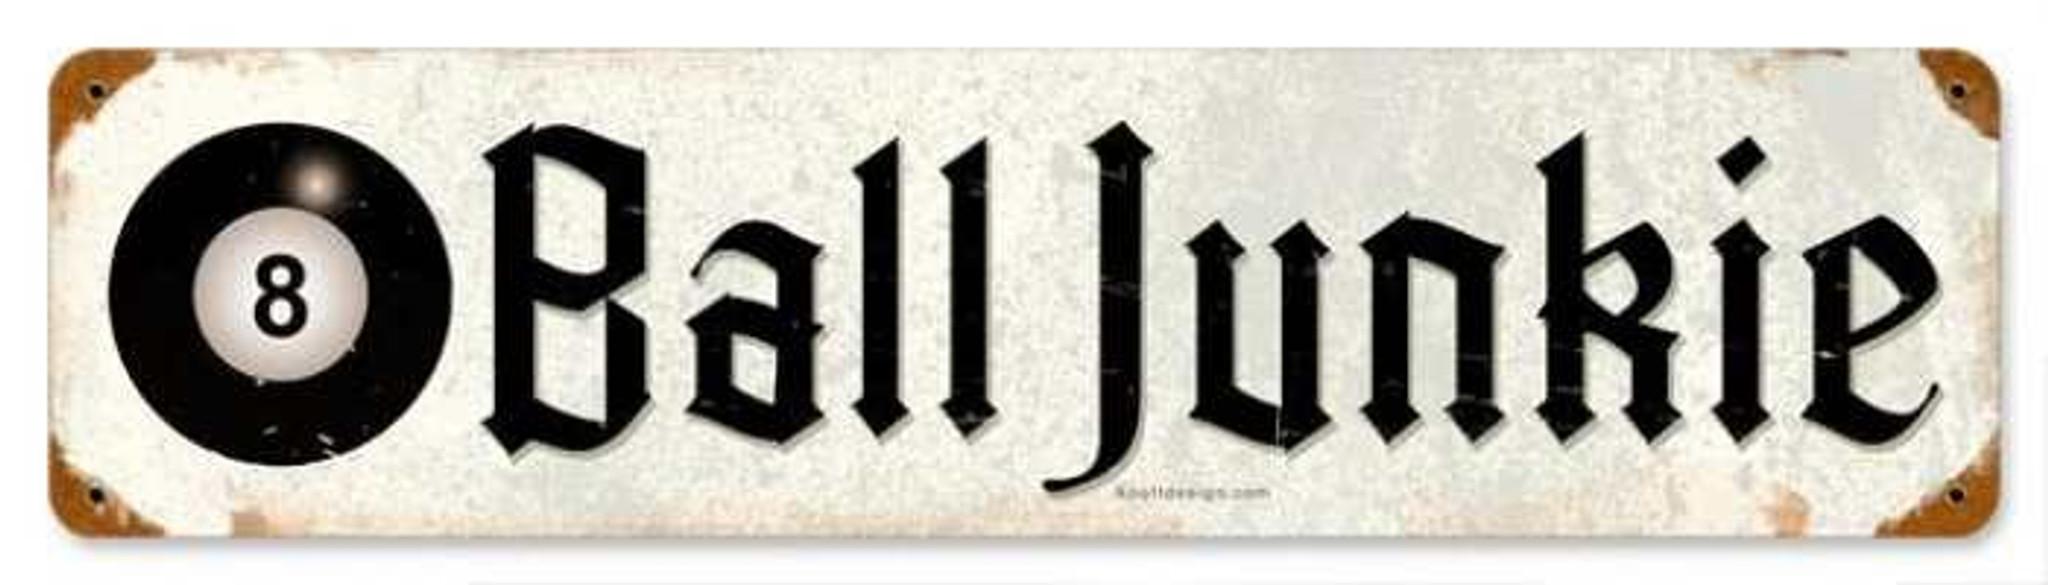 VINTAGE SIGN Made USA 8 Ball Junkie 5 x 20